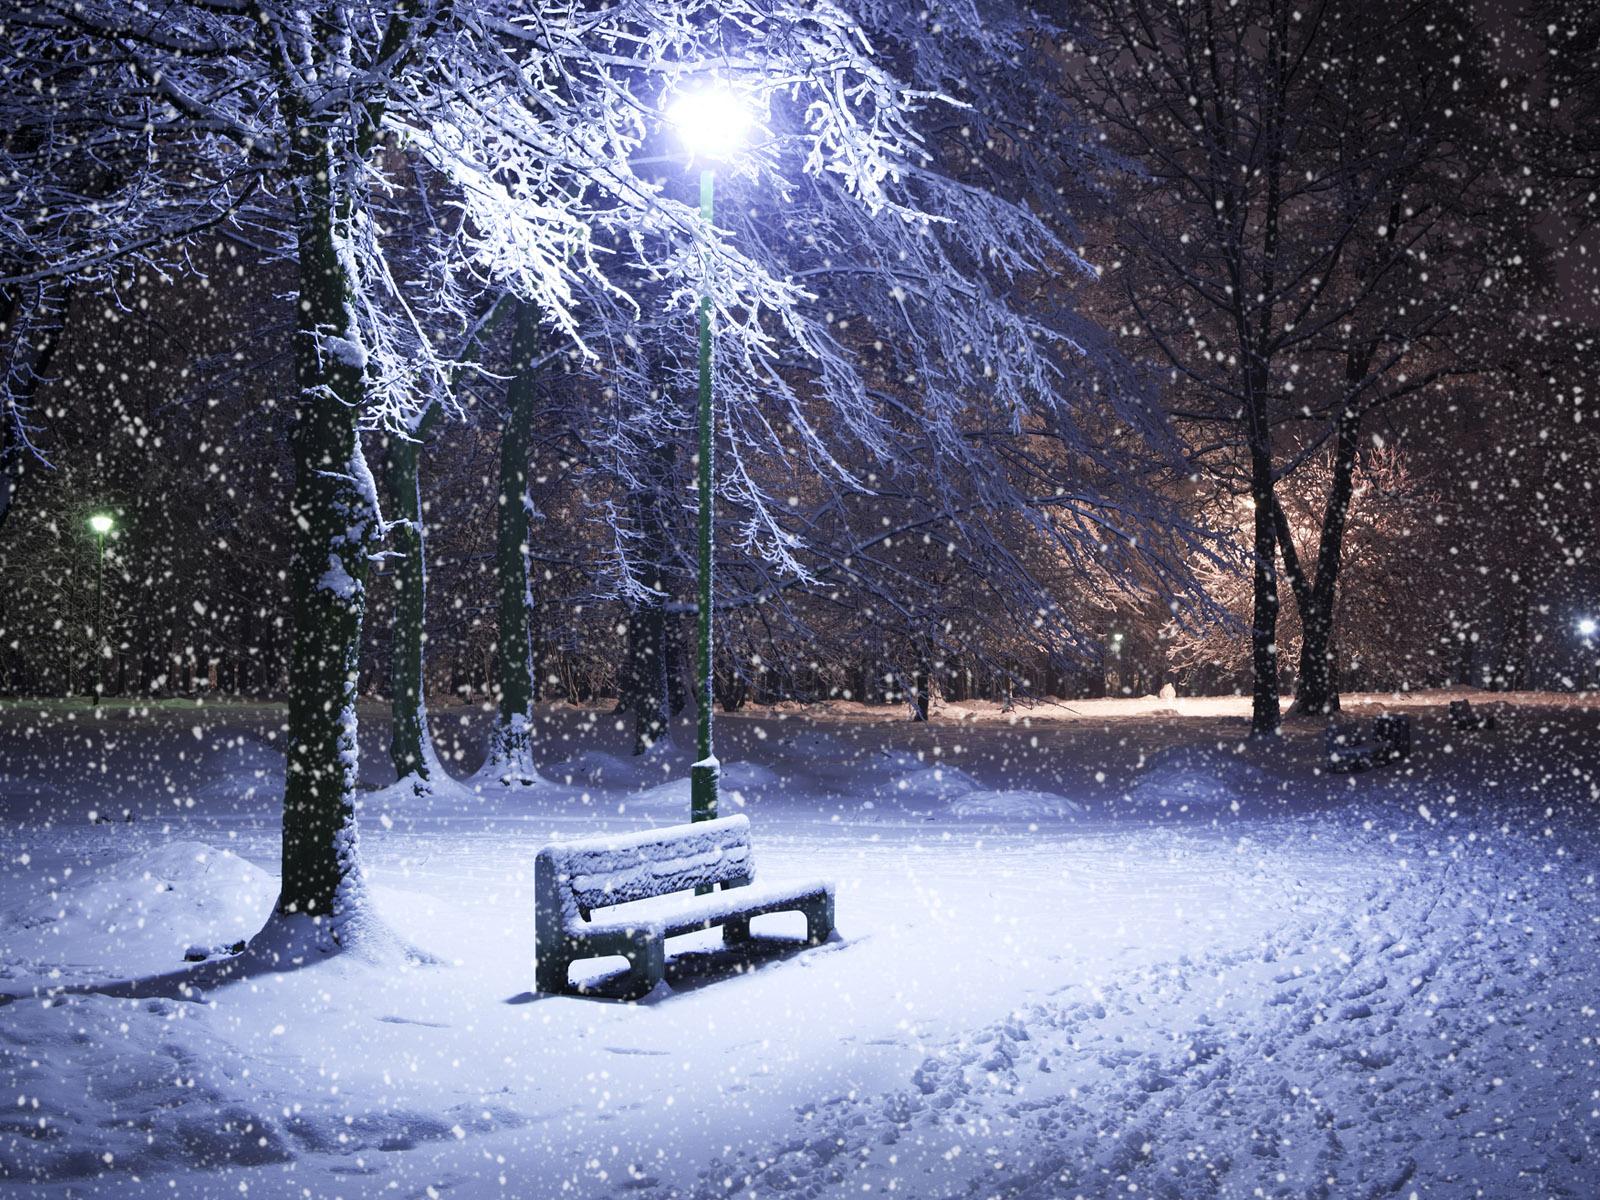 Google rezultati pretraživanja slika za http://sky-wallpaper.com/uploads/2010-12/snowing-scenery-wallpaper/1292909333-8WVUSOB.jpg